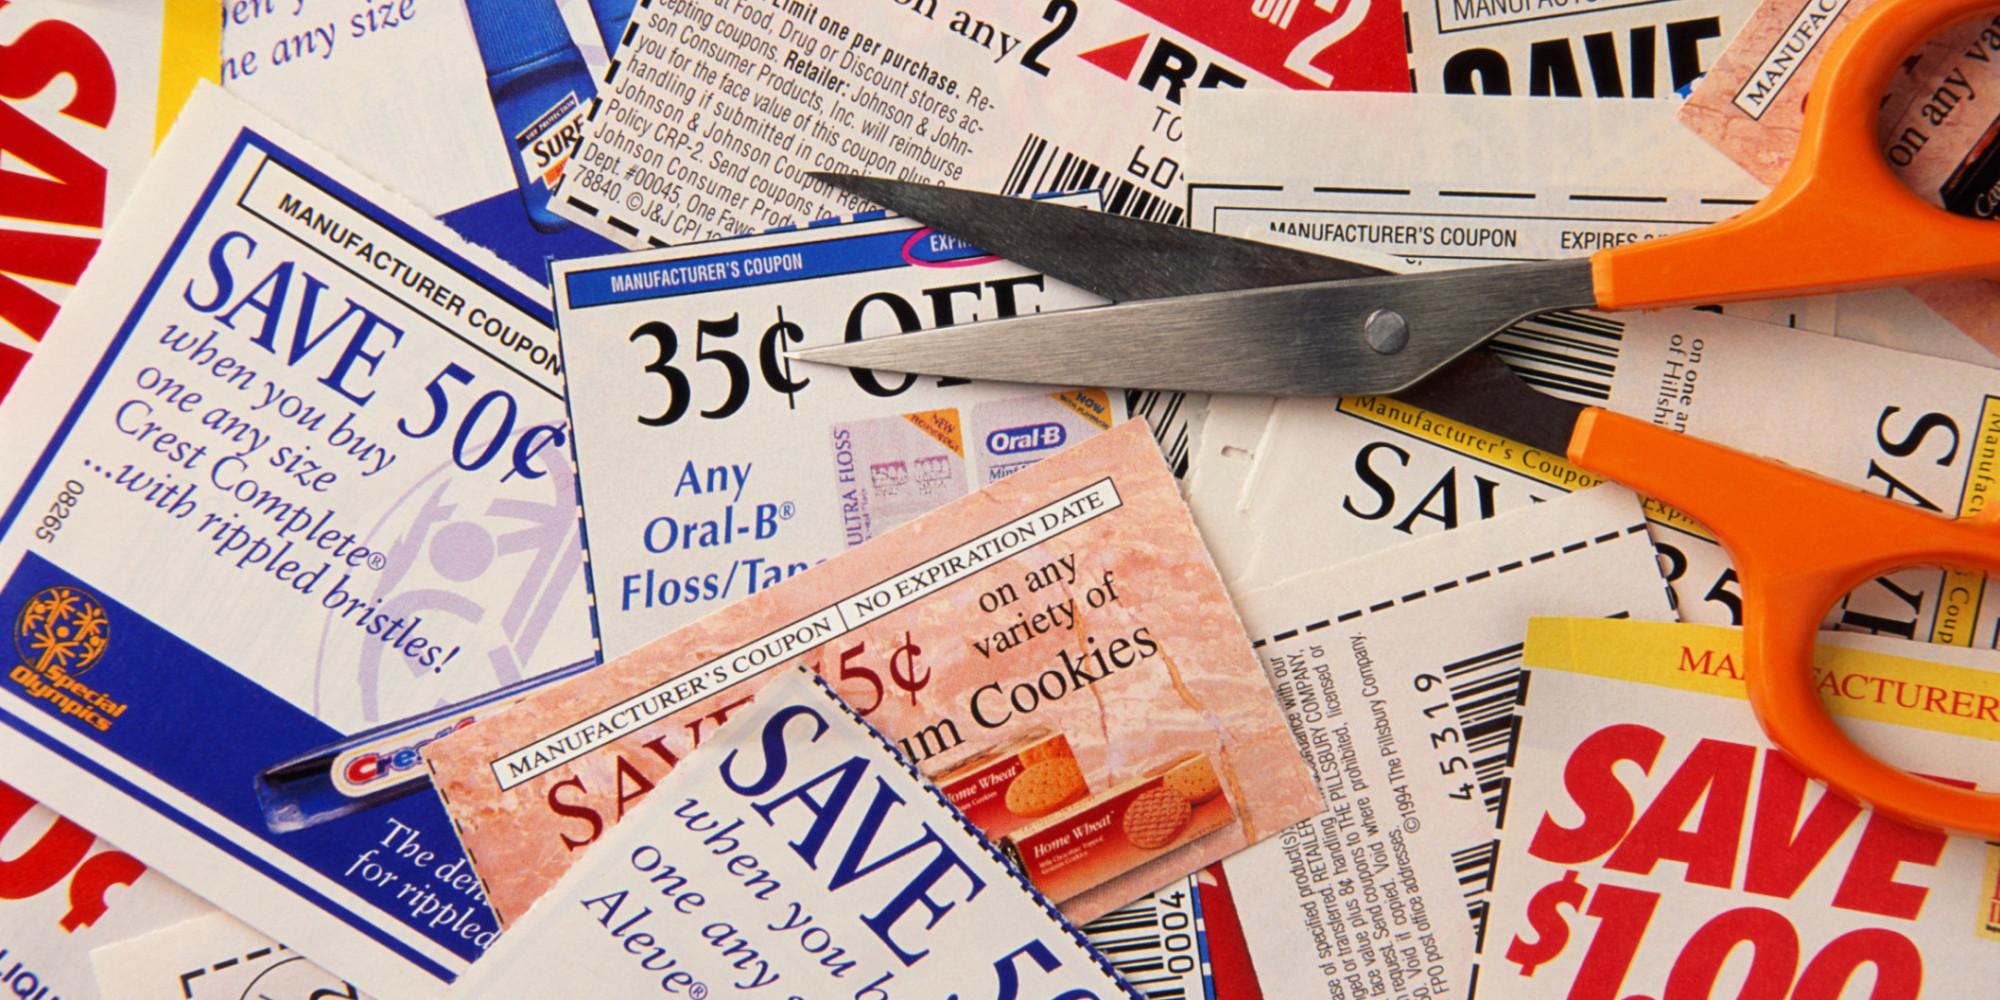 Extreme coupons uk 2018